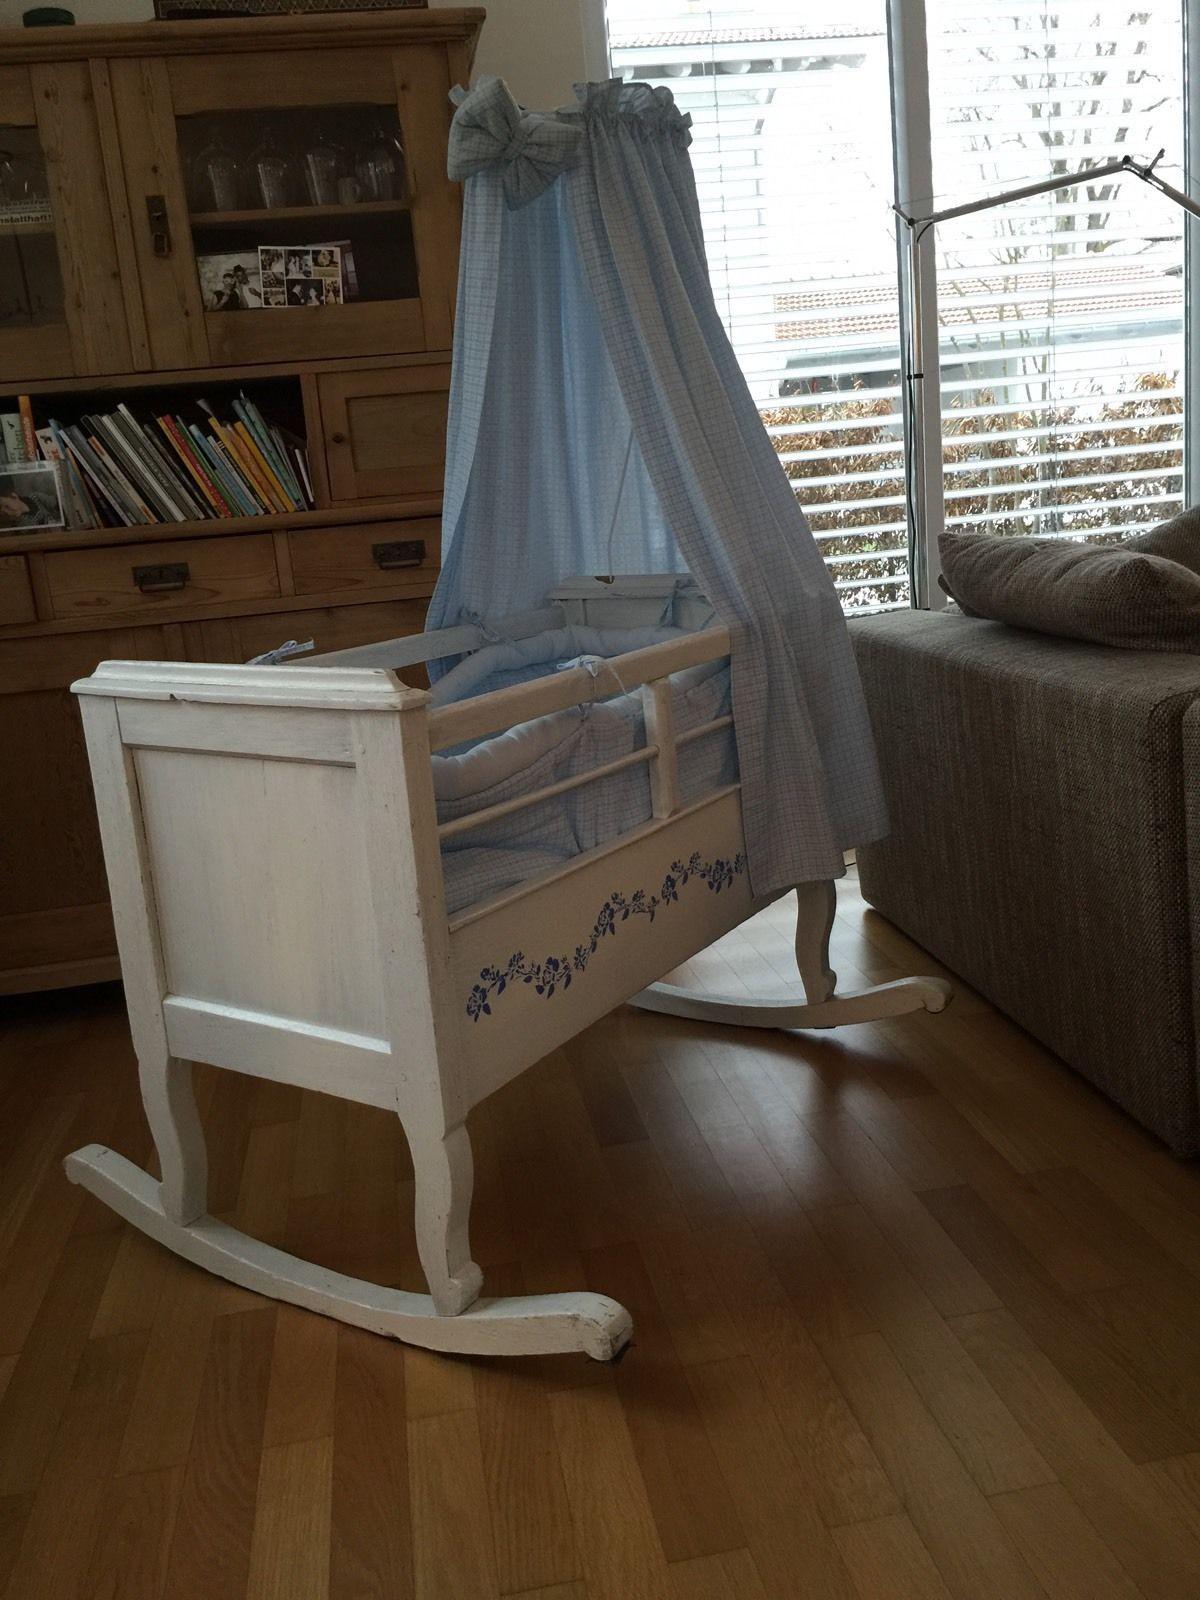 Relativ Kinderwiege Kinderbett Schaukelwiege Stubenwagen Babybett | eBay NK36